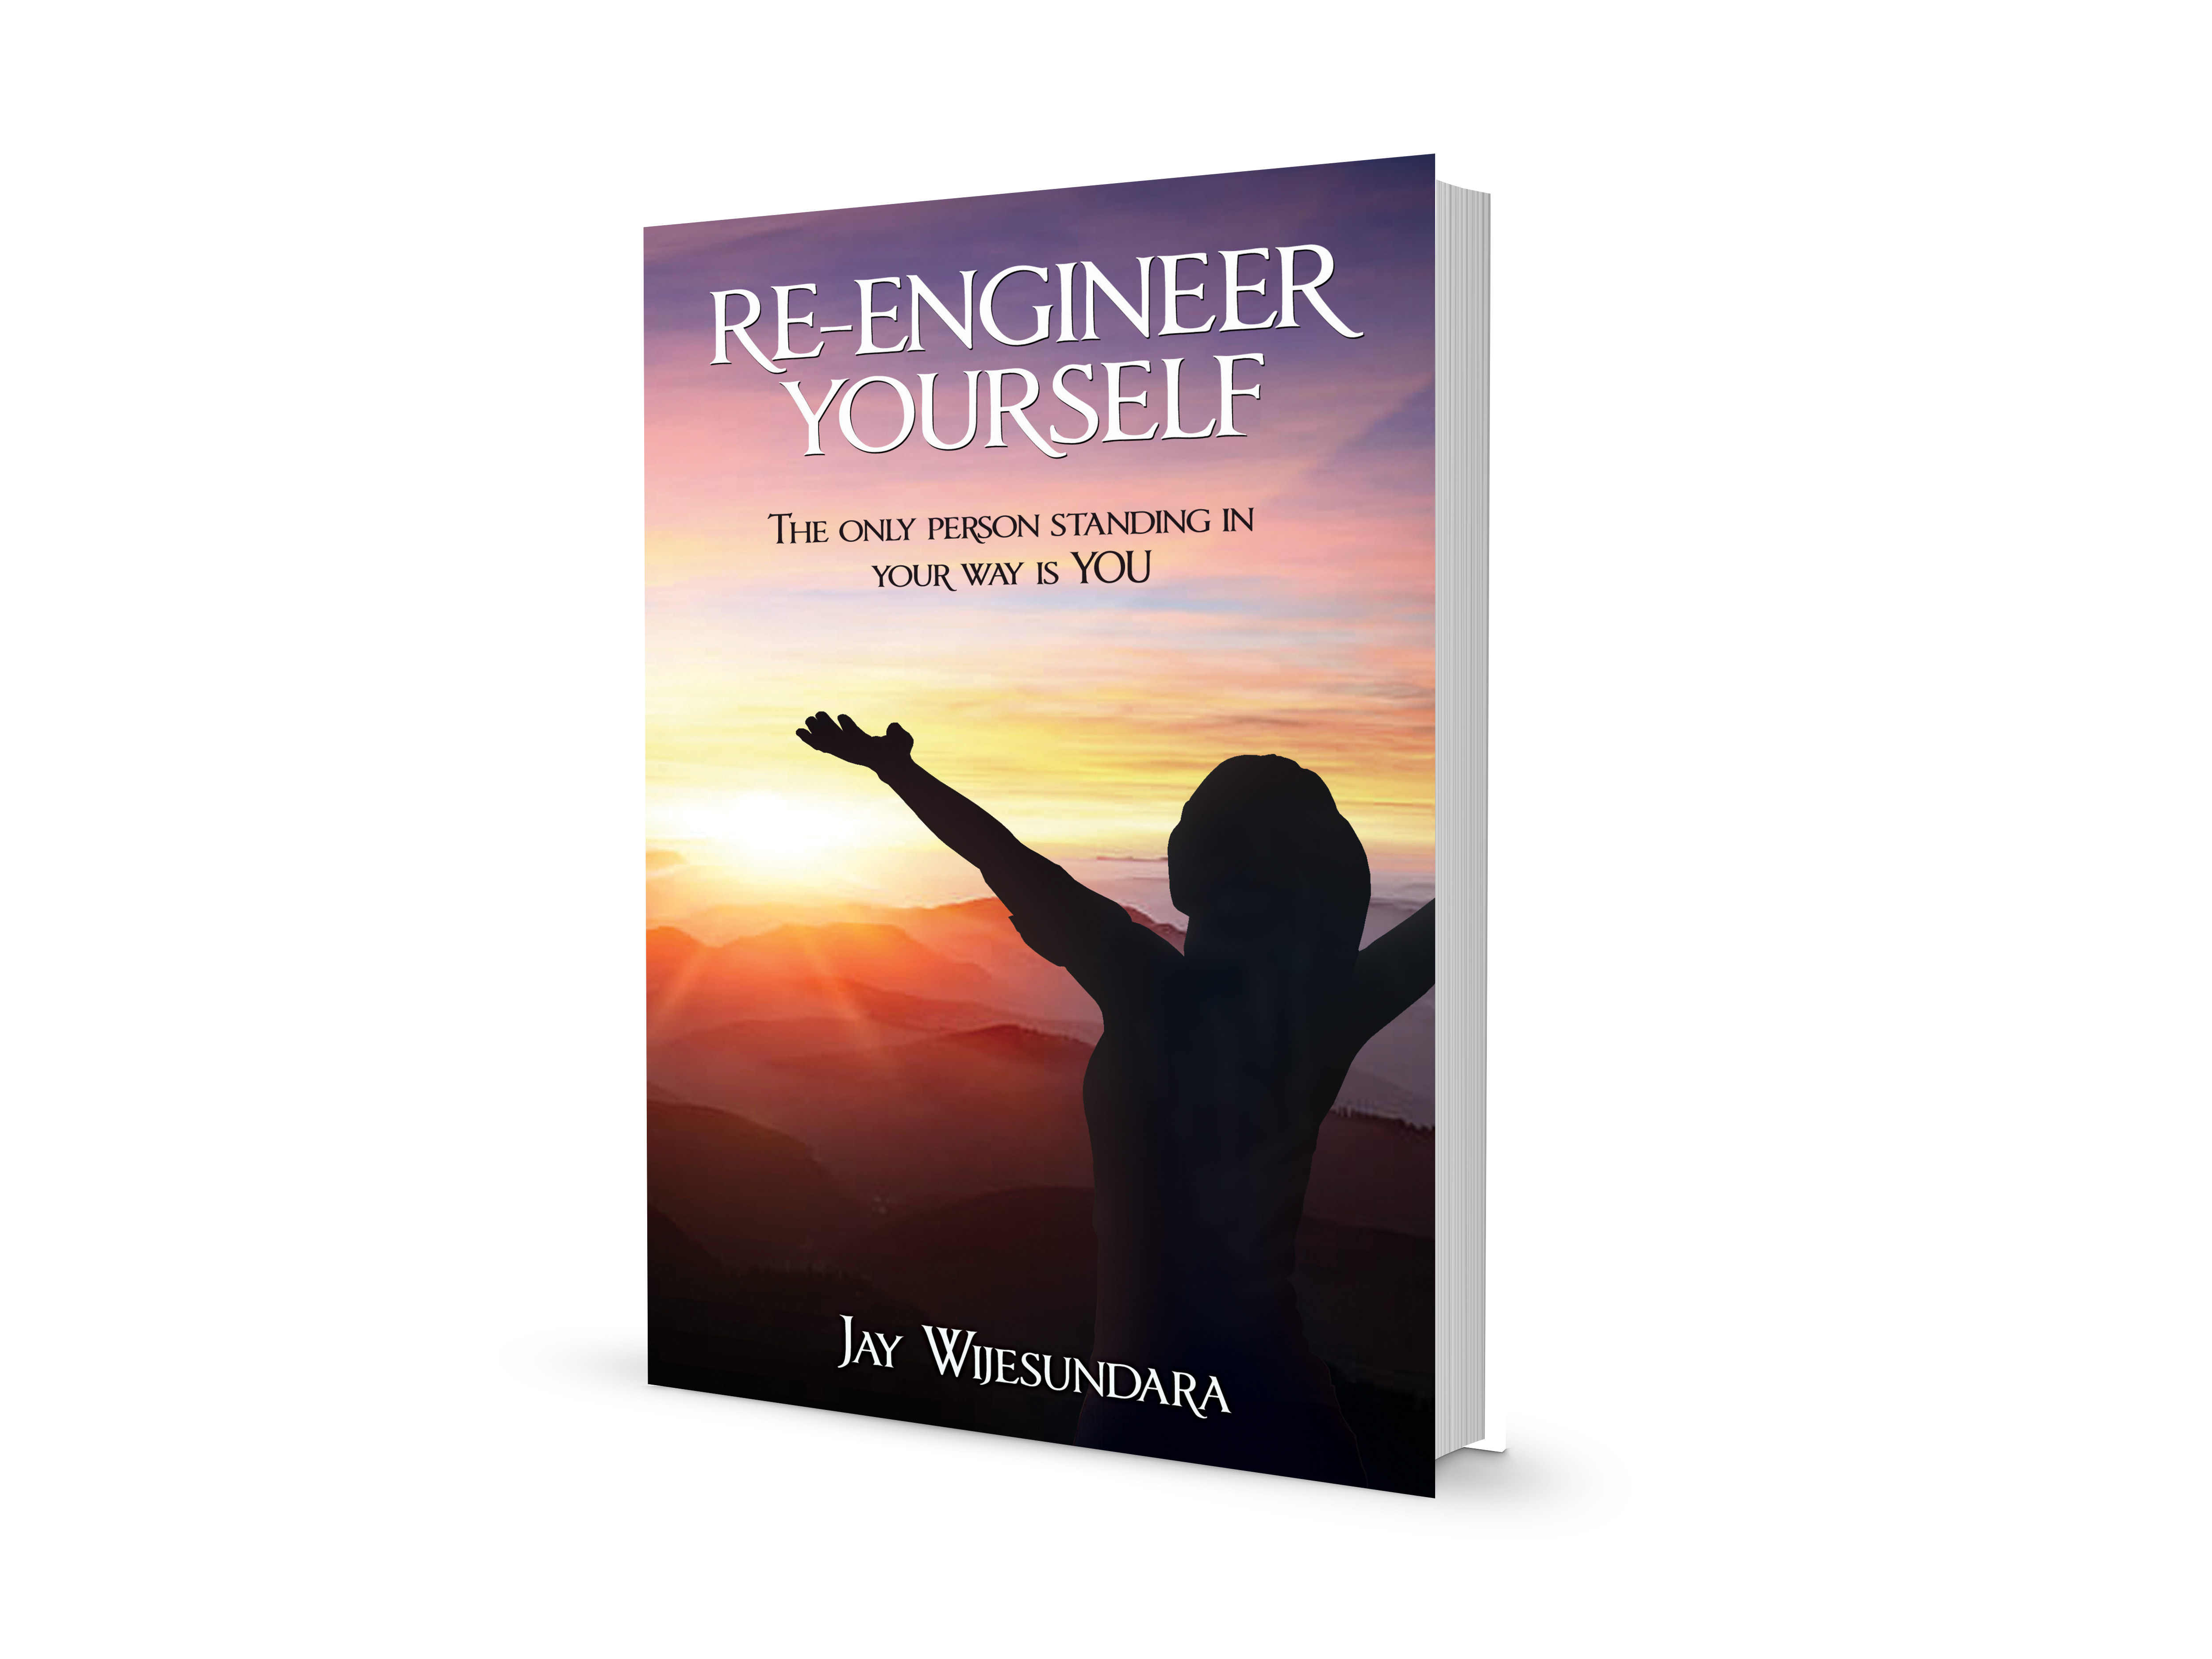 RE-ENGINEER YOURSELF BOOK READING & WORKSHOP